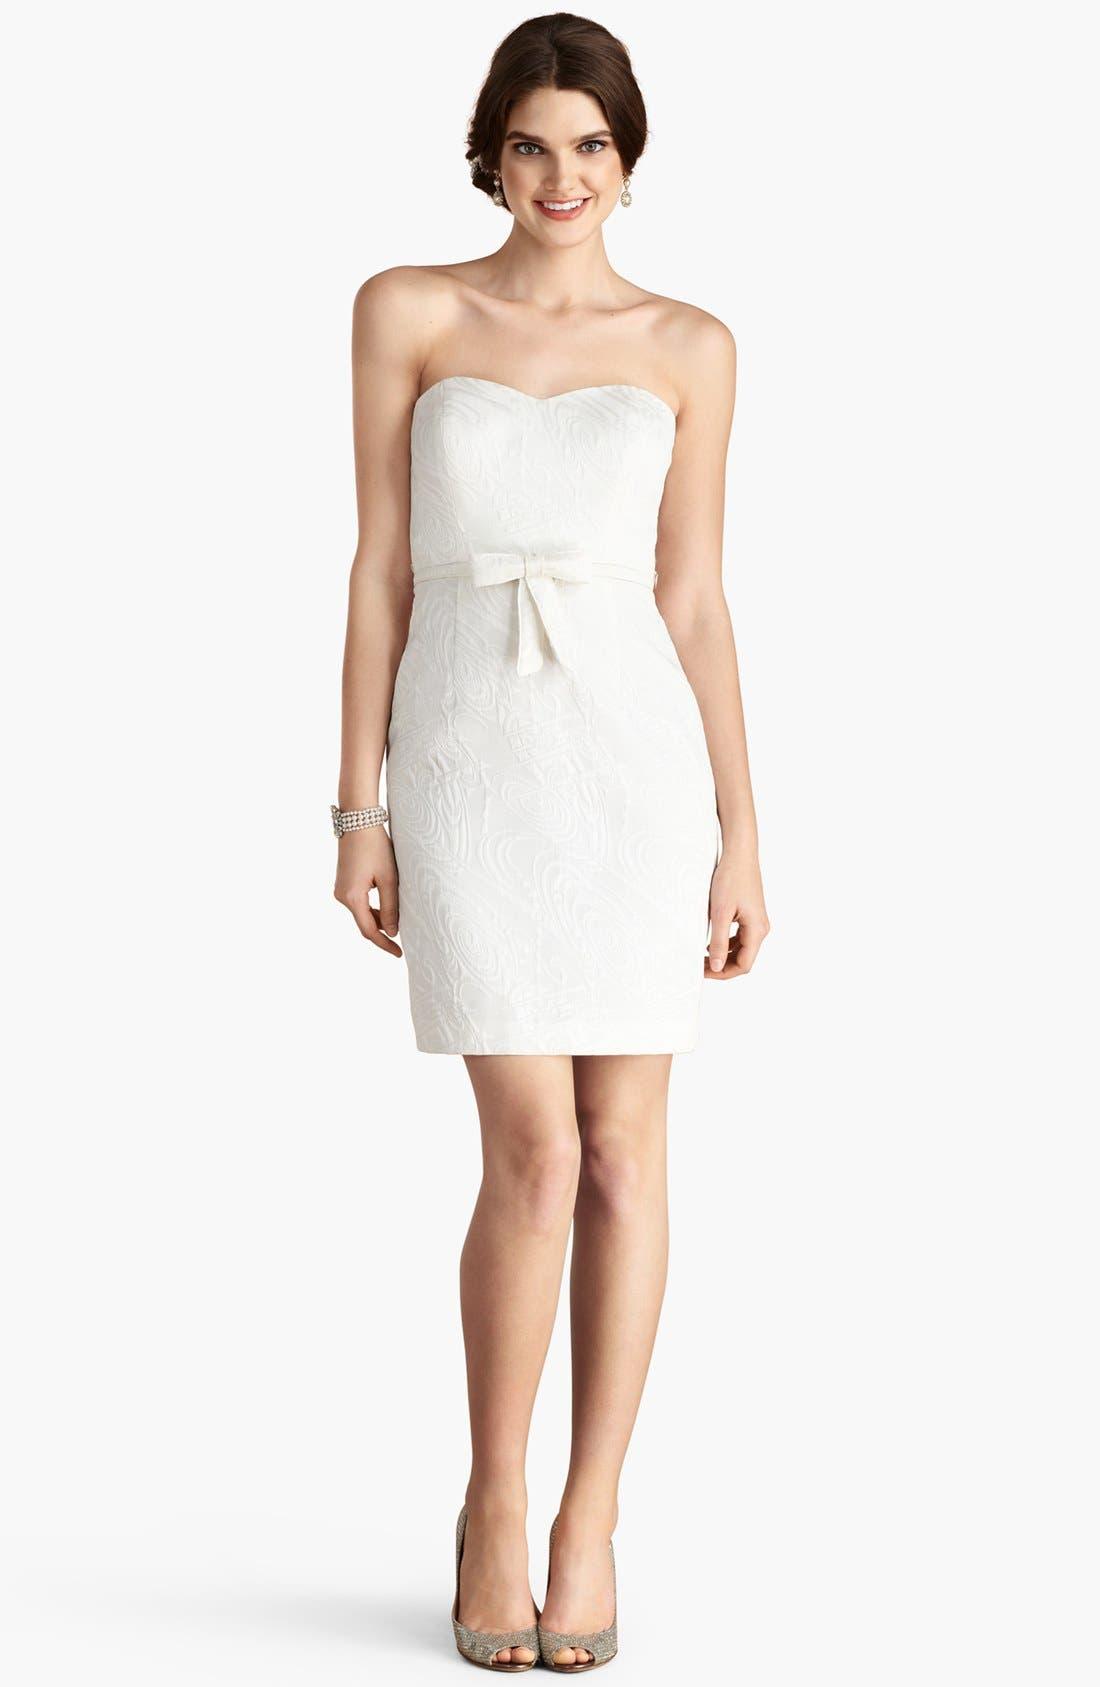 Alternate Image 1 Selected - Donna Morgan 'Brooke' Strapless Jacquard Sheath Dress